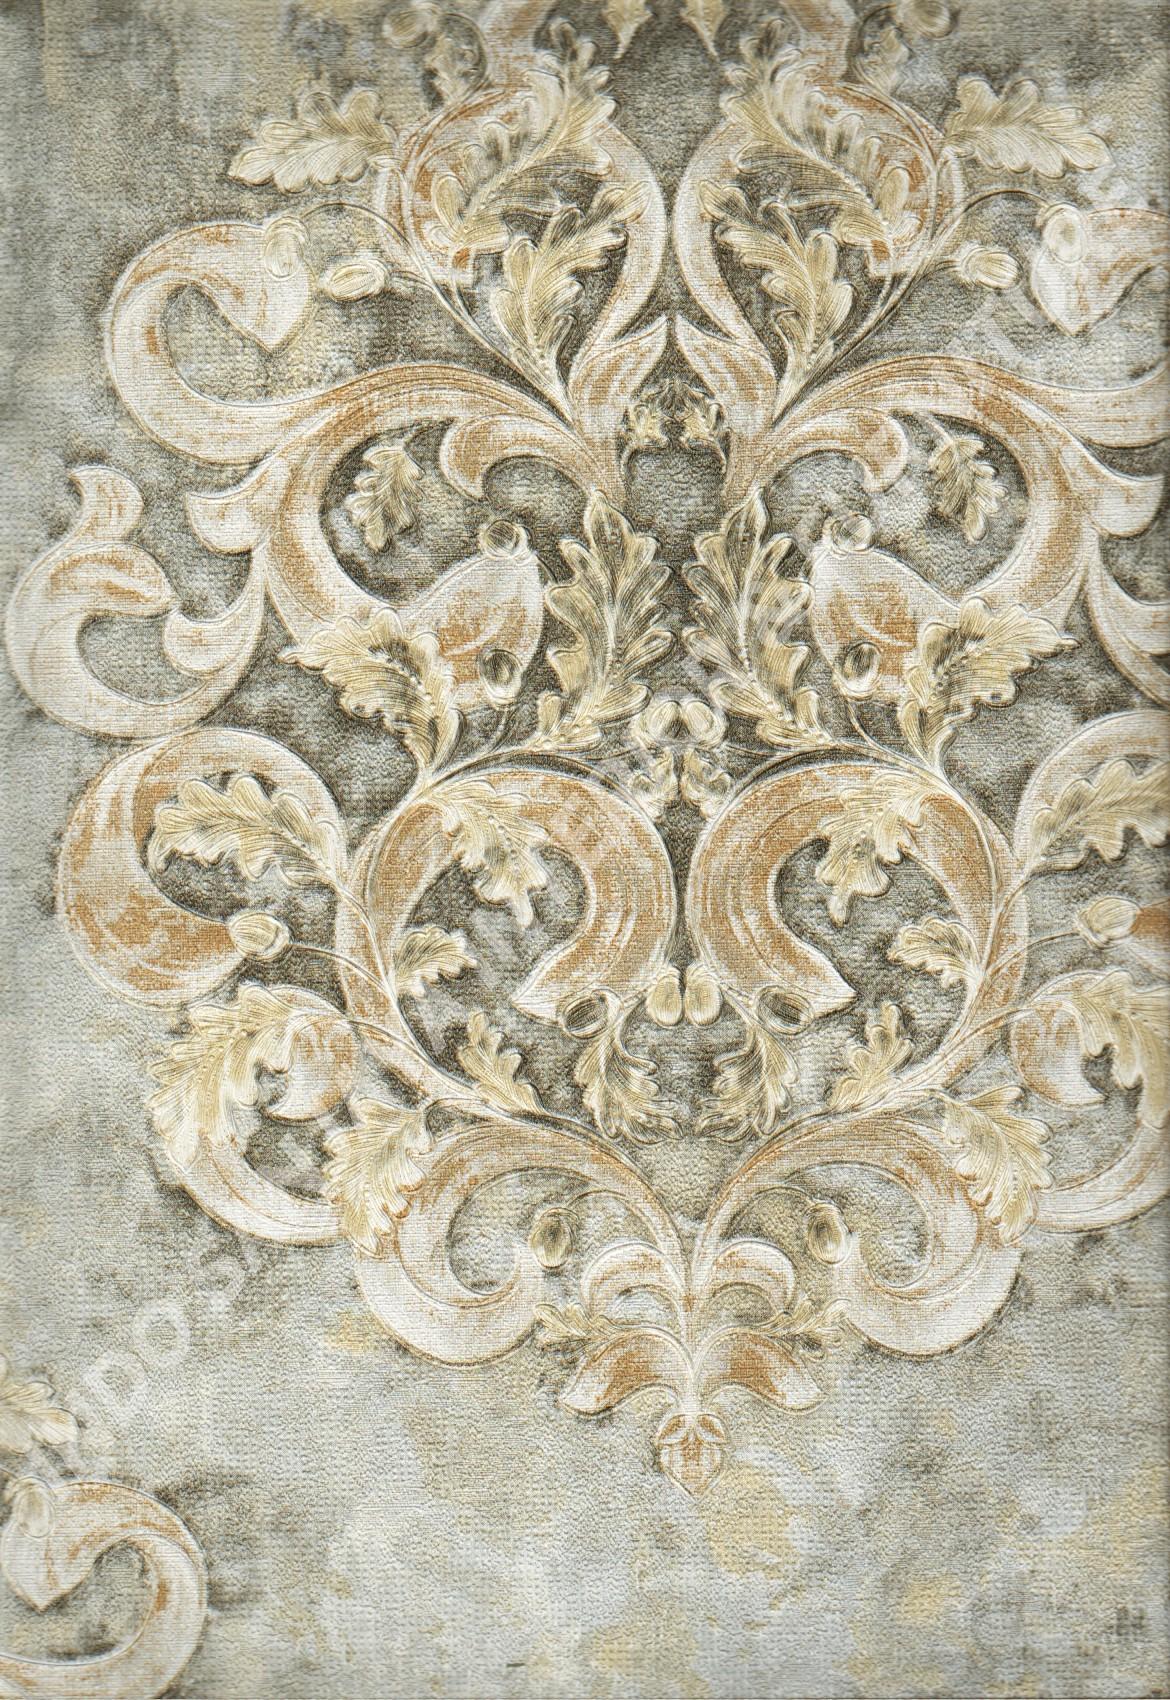 wallpaper   Wallpaper Klasik Batik (Damask) DL10302:DL10302 corak  warna